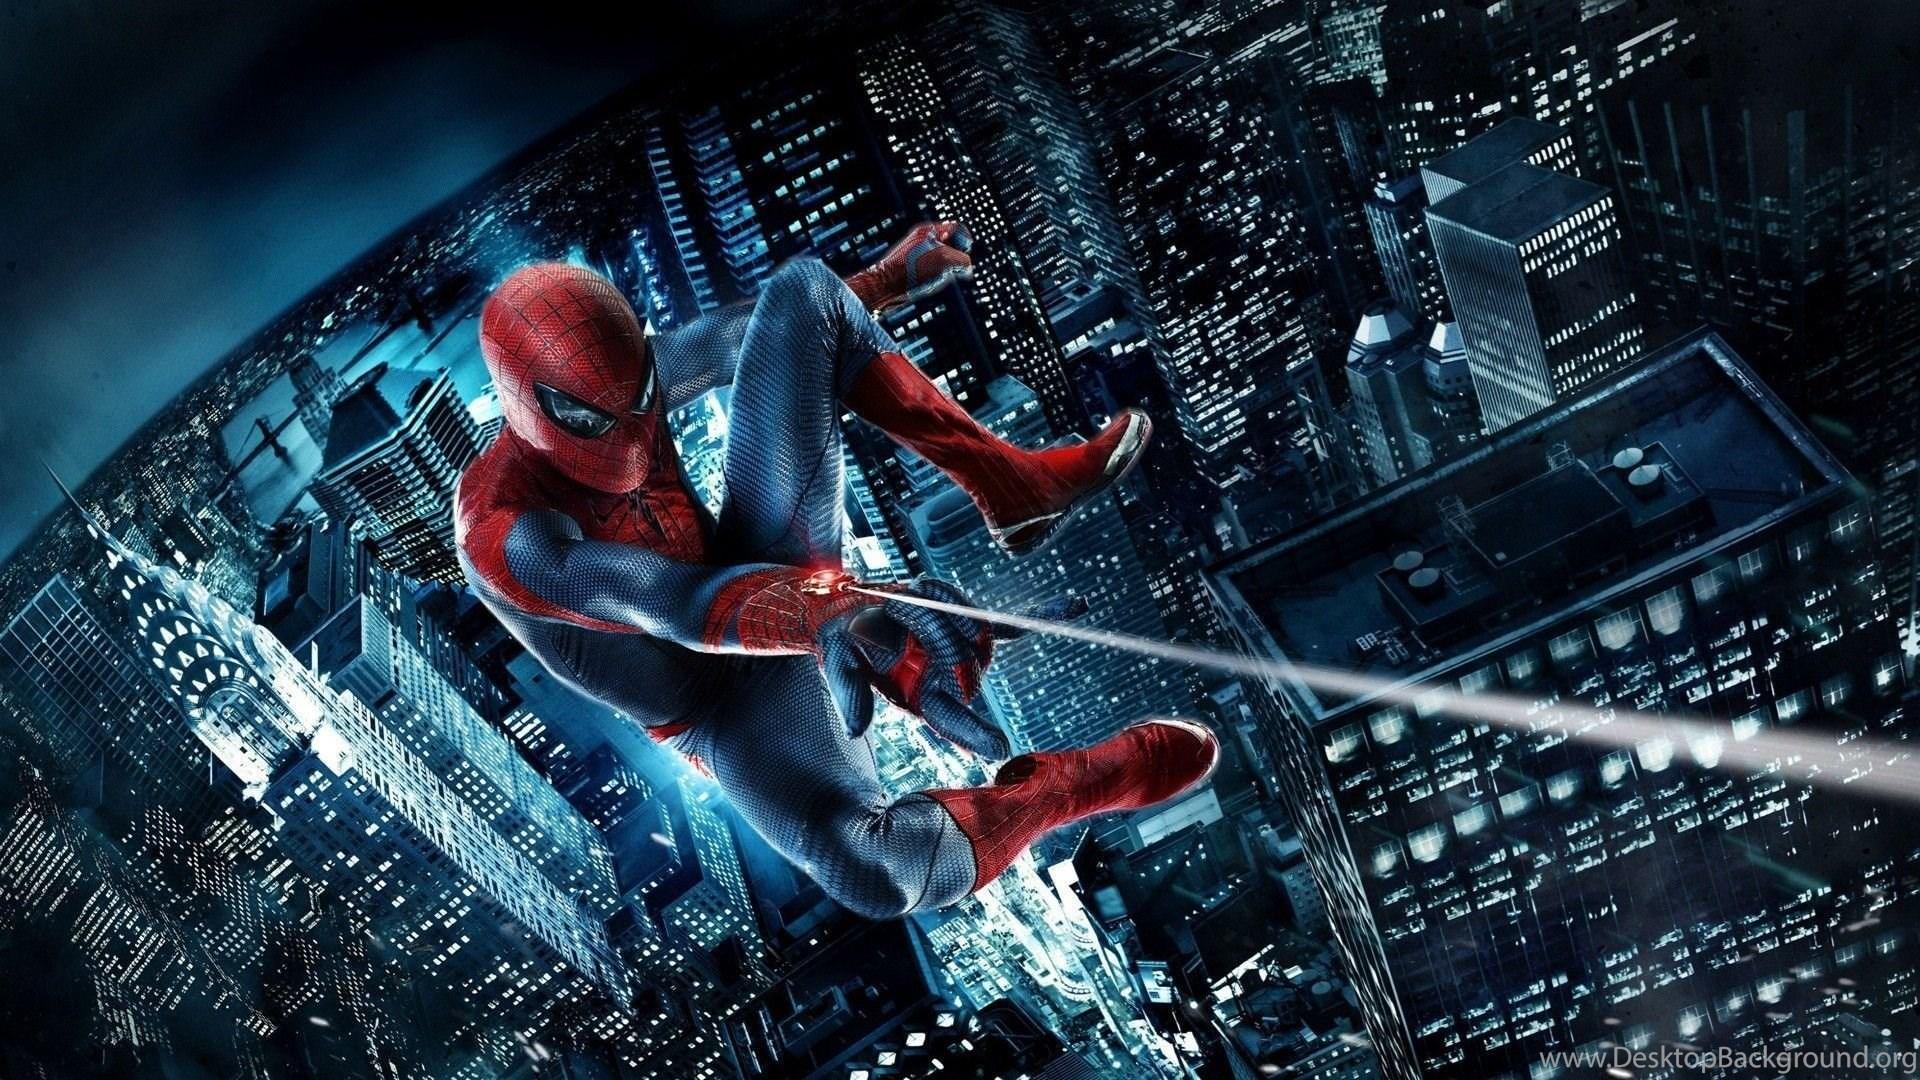 download spiderman wallpapers hd resolution desktop background